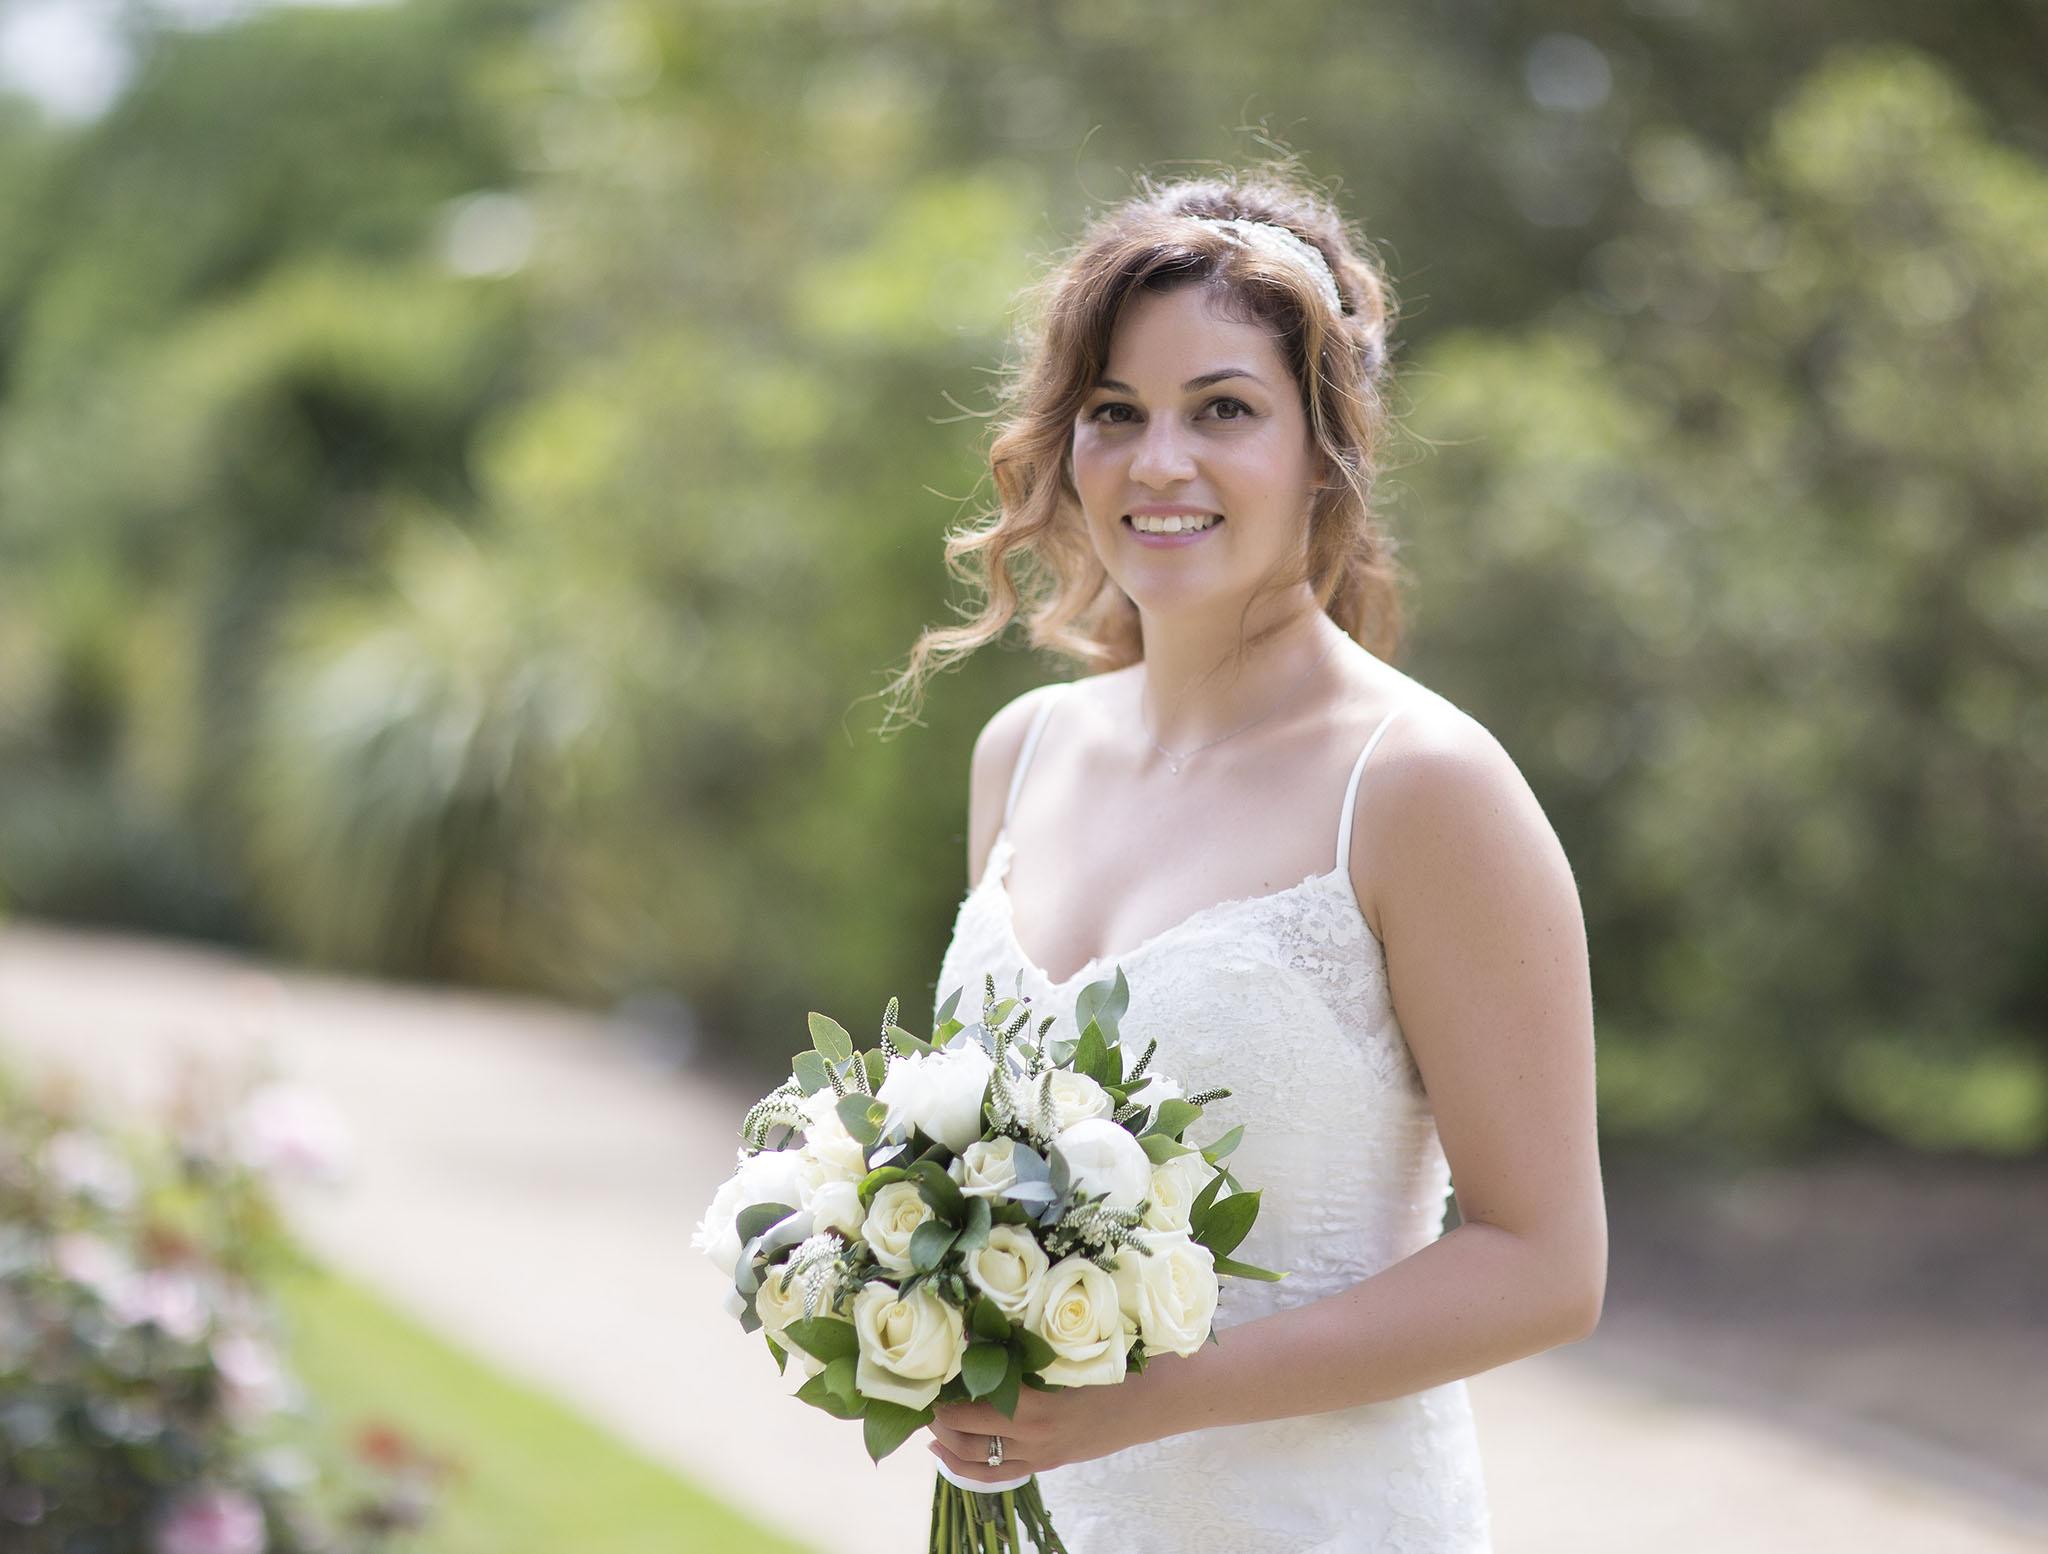 elizabethgphotography_kingslangley_hertfordshire_fineart_wedding_enfield_ricky_nicole_nahlis_38.jpg